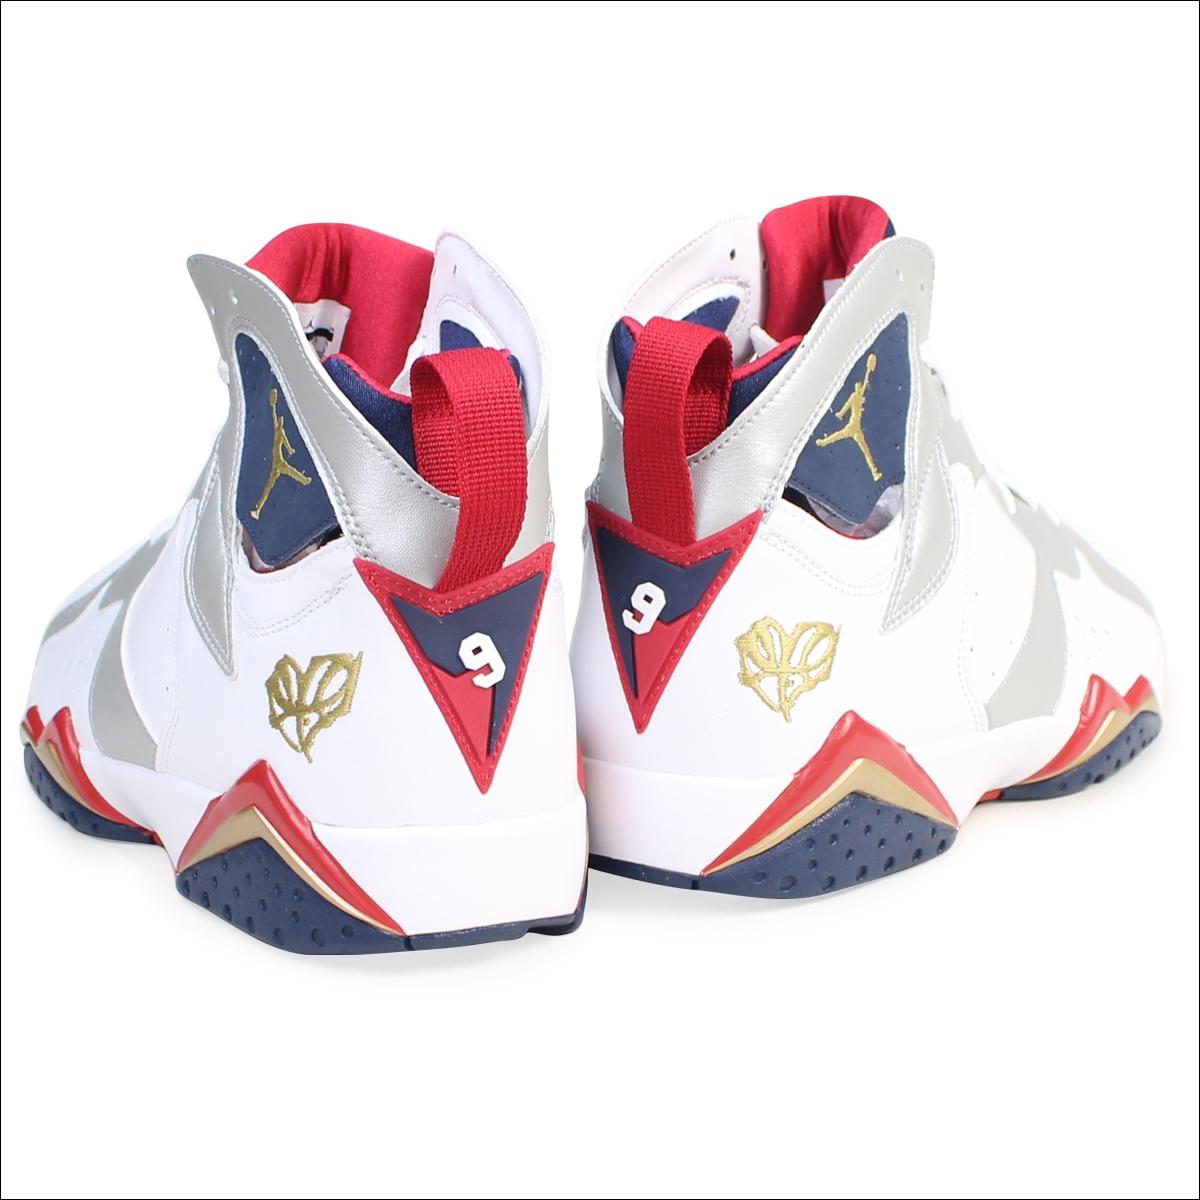 2b2dd410e7e ... NIKE Nike Air Jordan 7 nostalgic sneakers AIR JORDAN 7 RETRO OLYMPIC  304,775-103 men's